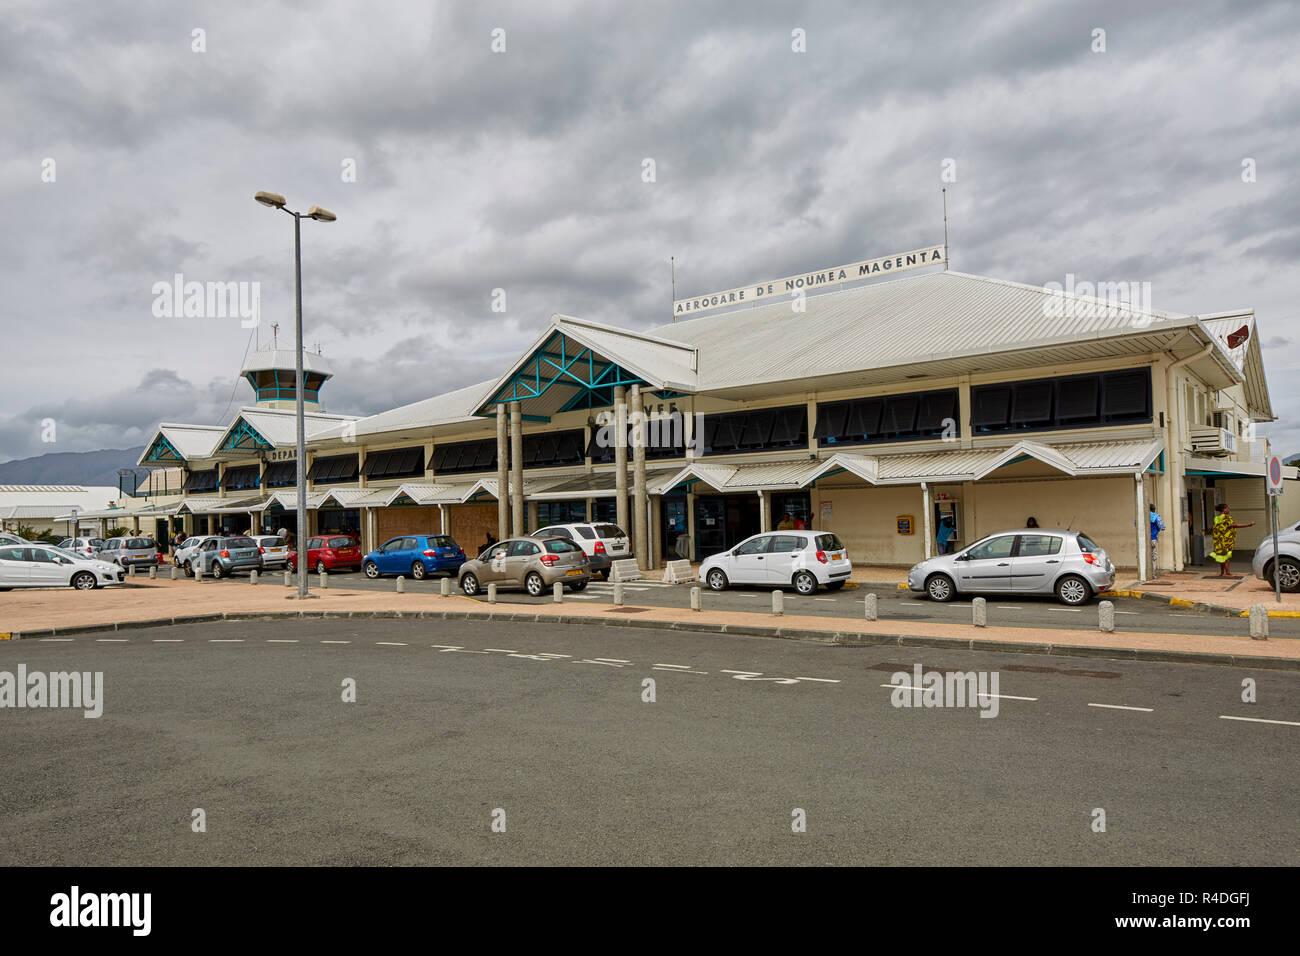 Domestic airport Aerogare de Noumea Magenta airport in Noumea, New Caledonia - Stock Image